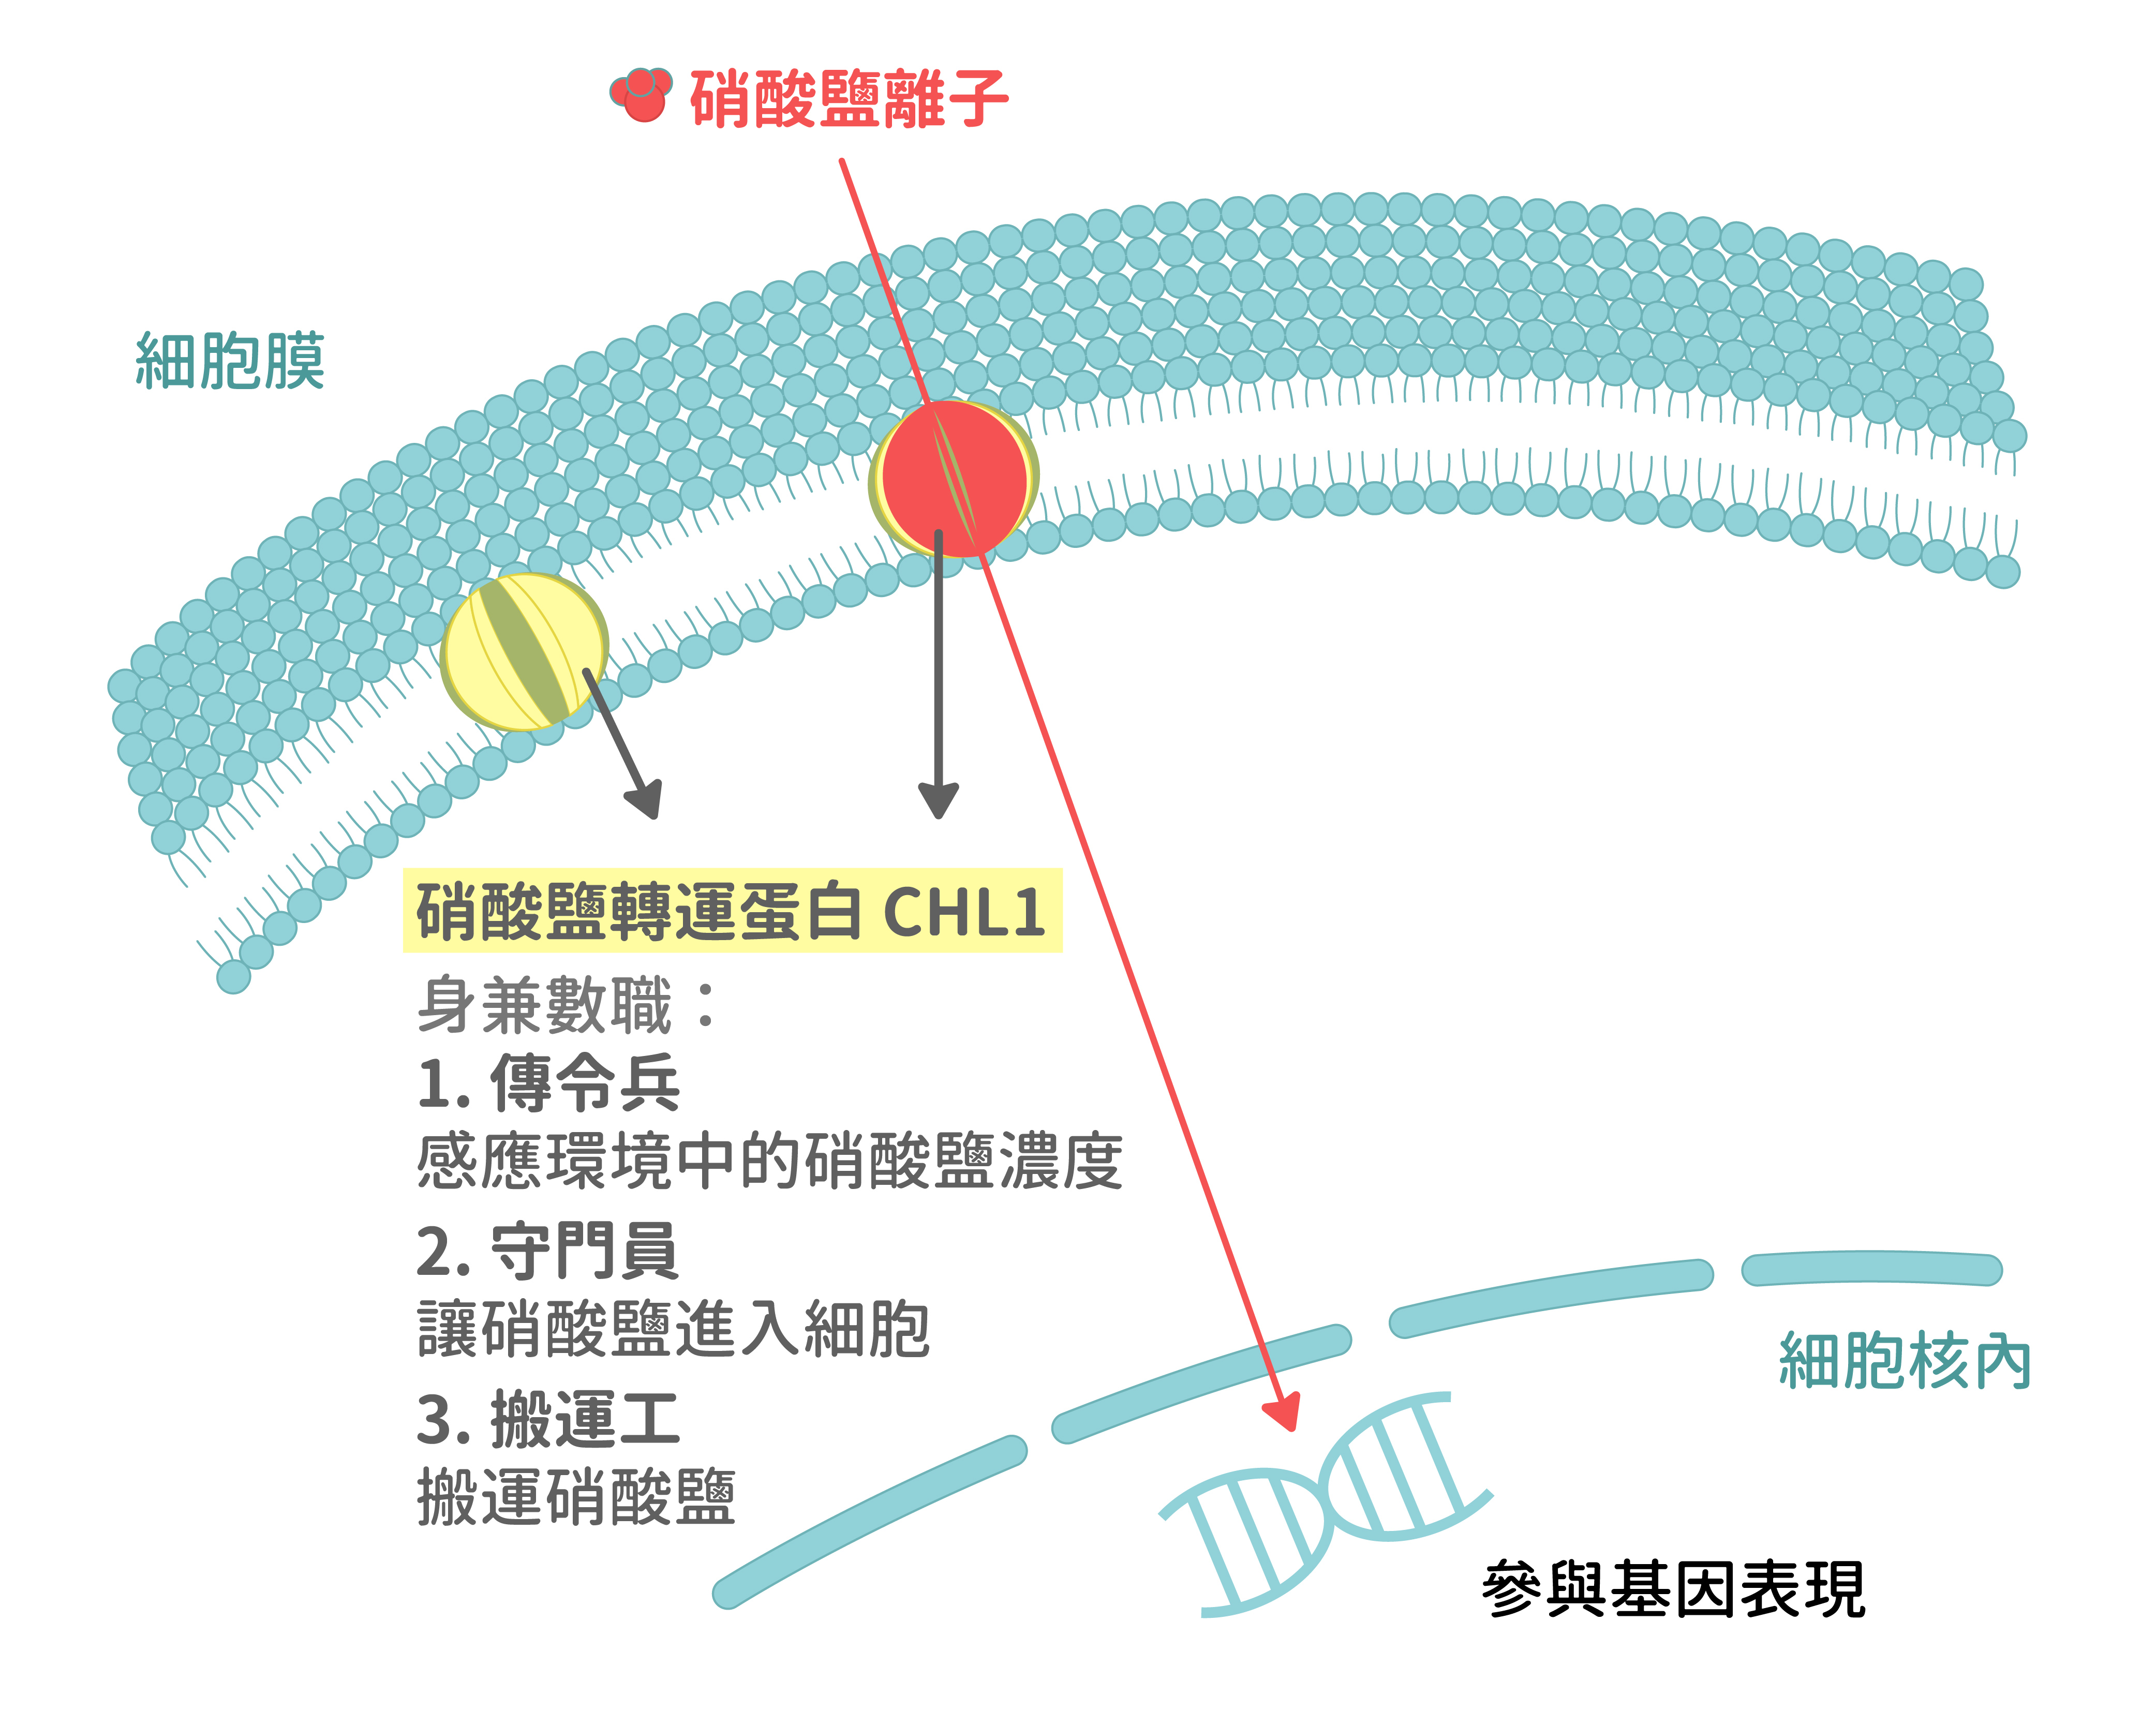 位於細胞膜,身兼數職的硝酸鹽轉運蛋白 CHL1 。 資料來源│C.-H. Ho, S.-H. Lin, H.-C. Hu, and Y.-F. Tsay* (2009) CHL1 Functions as a Nitrate Sensor in Plants. Cell 138, 1184–1194. 圖說重製│江佩津、張語辰